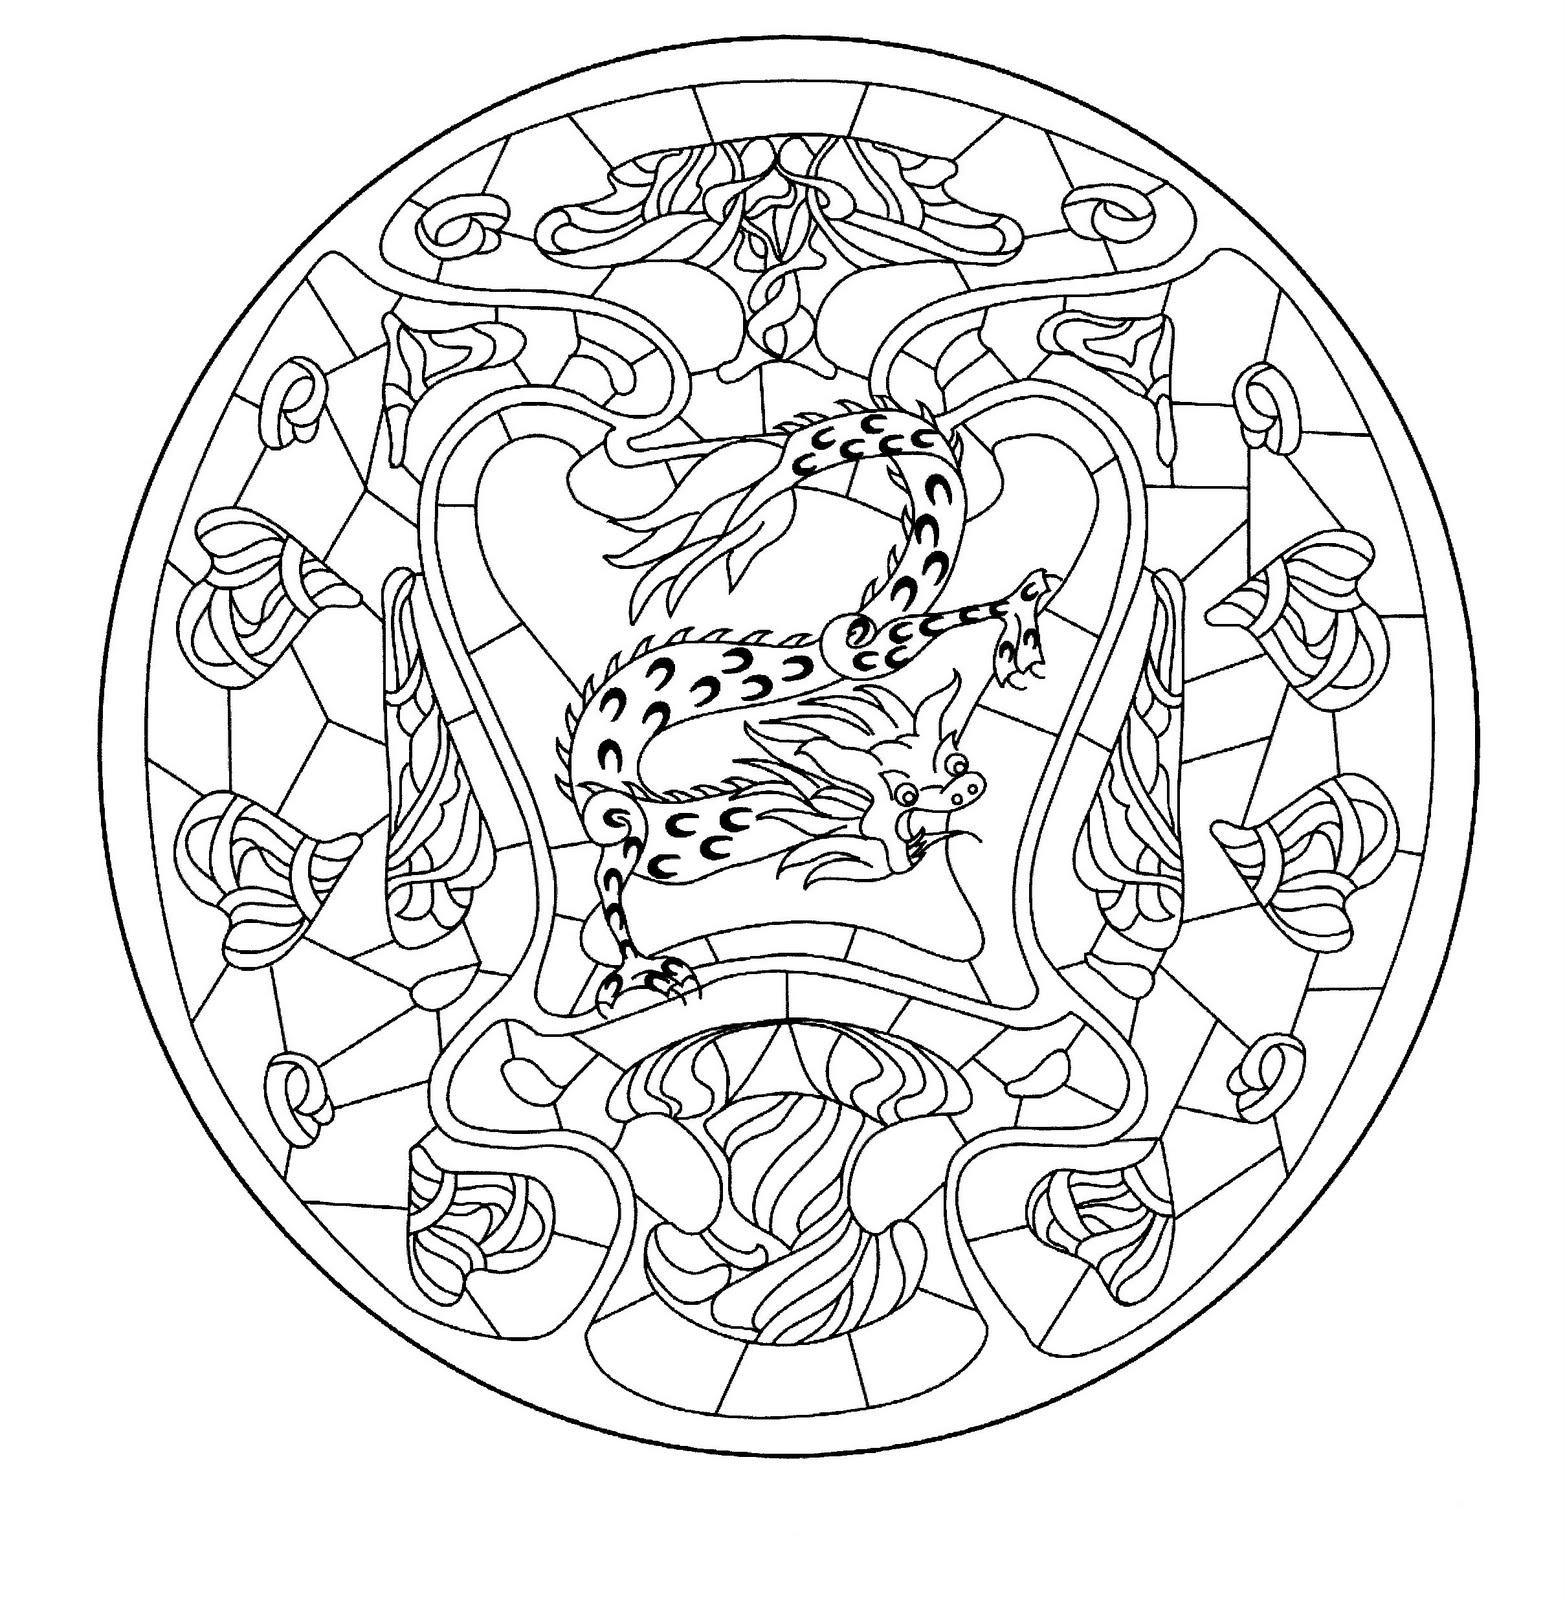 Imprimir mandalas de dragon - Imagui